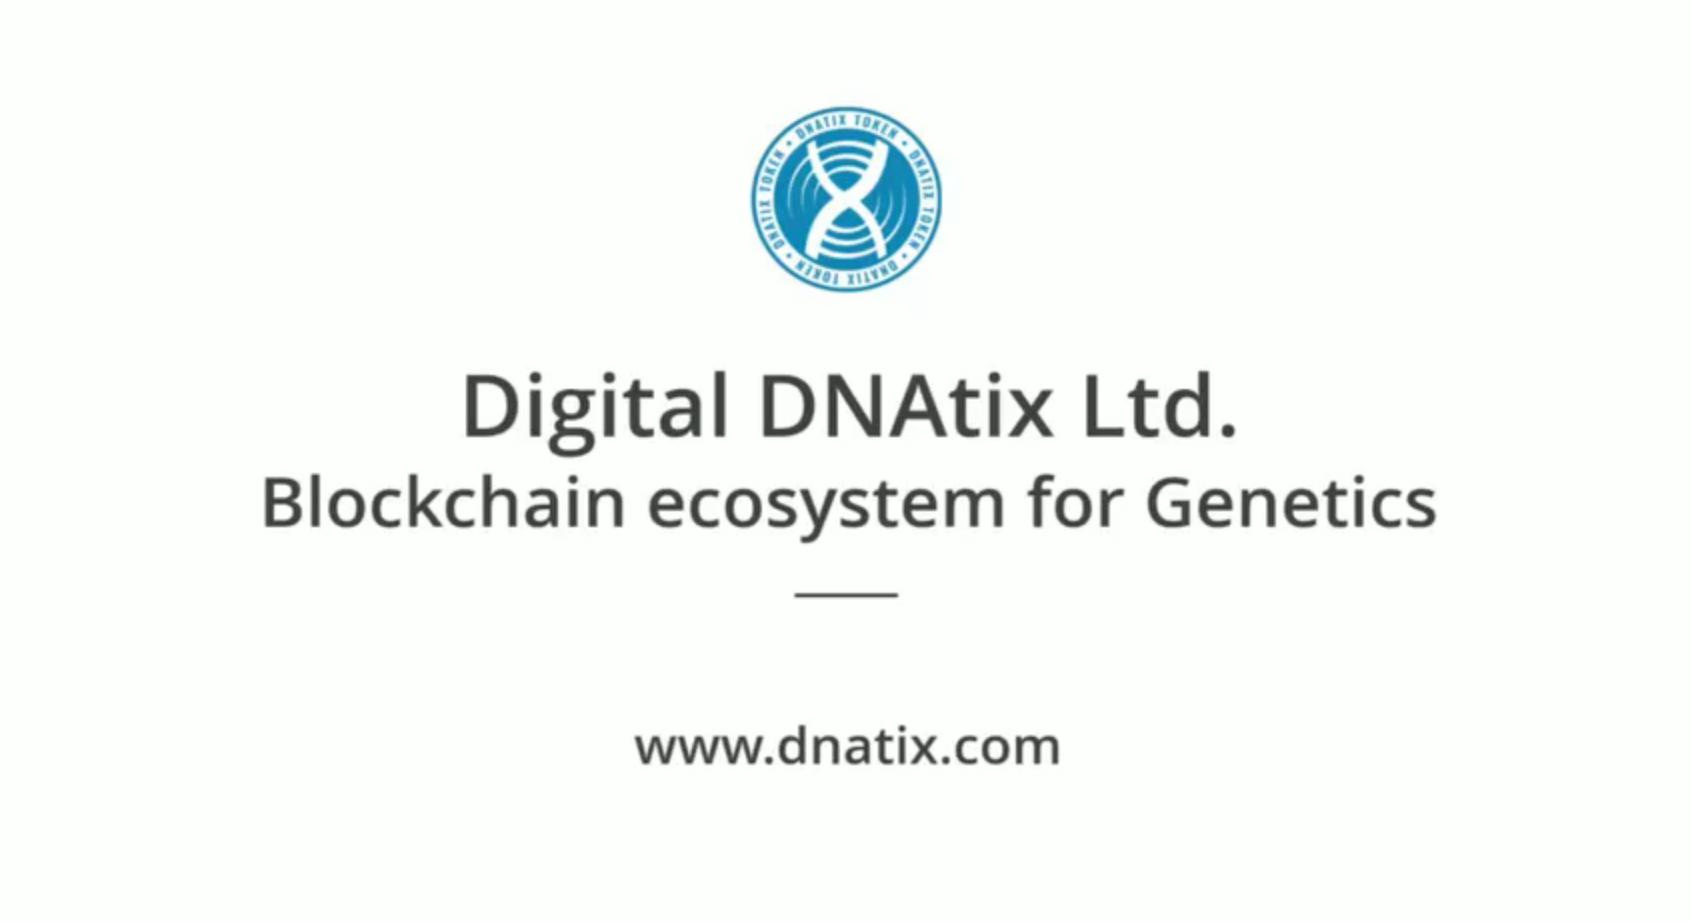 DNAtix - Blockchain Ecosystem for Genetics